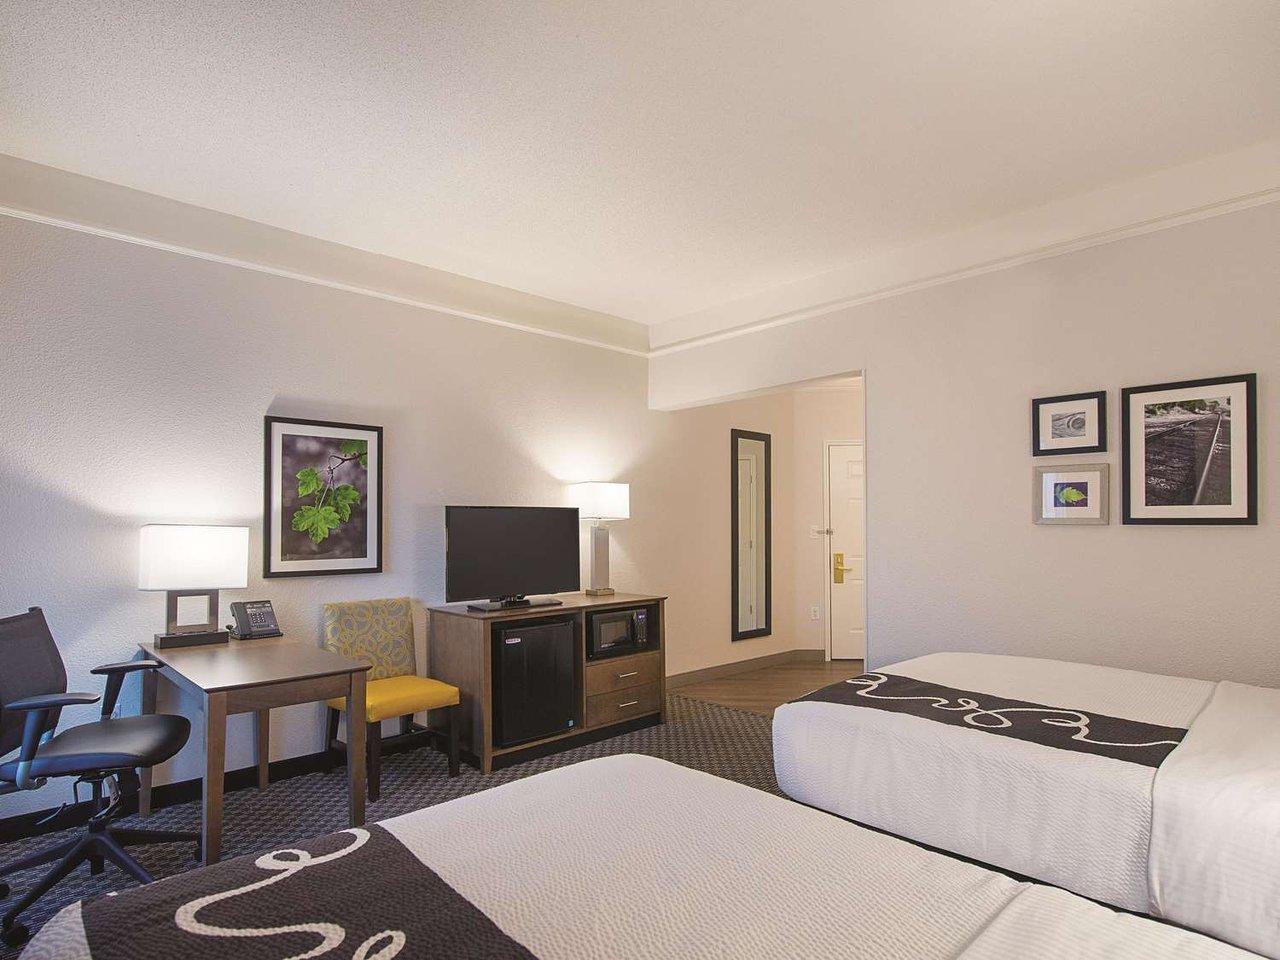 la quinta inn suites by wyndham oklahoma city nw expwy 68 rh tripadvisor com